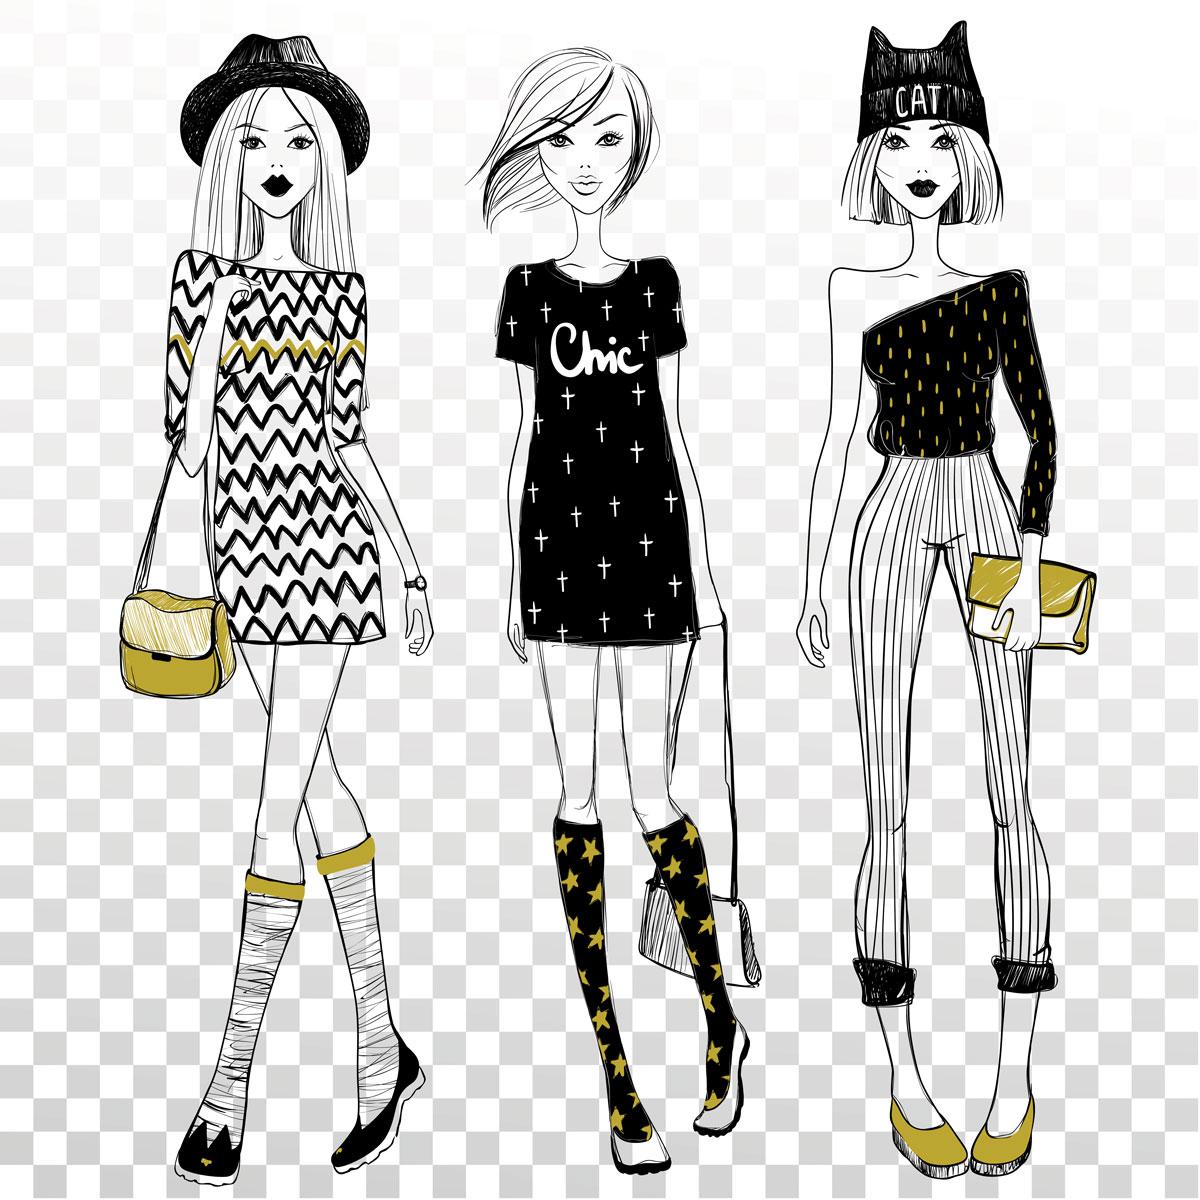 Июль и август – месяцы моды. Джоанна Мансанаро